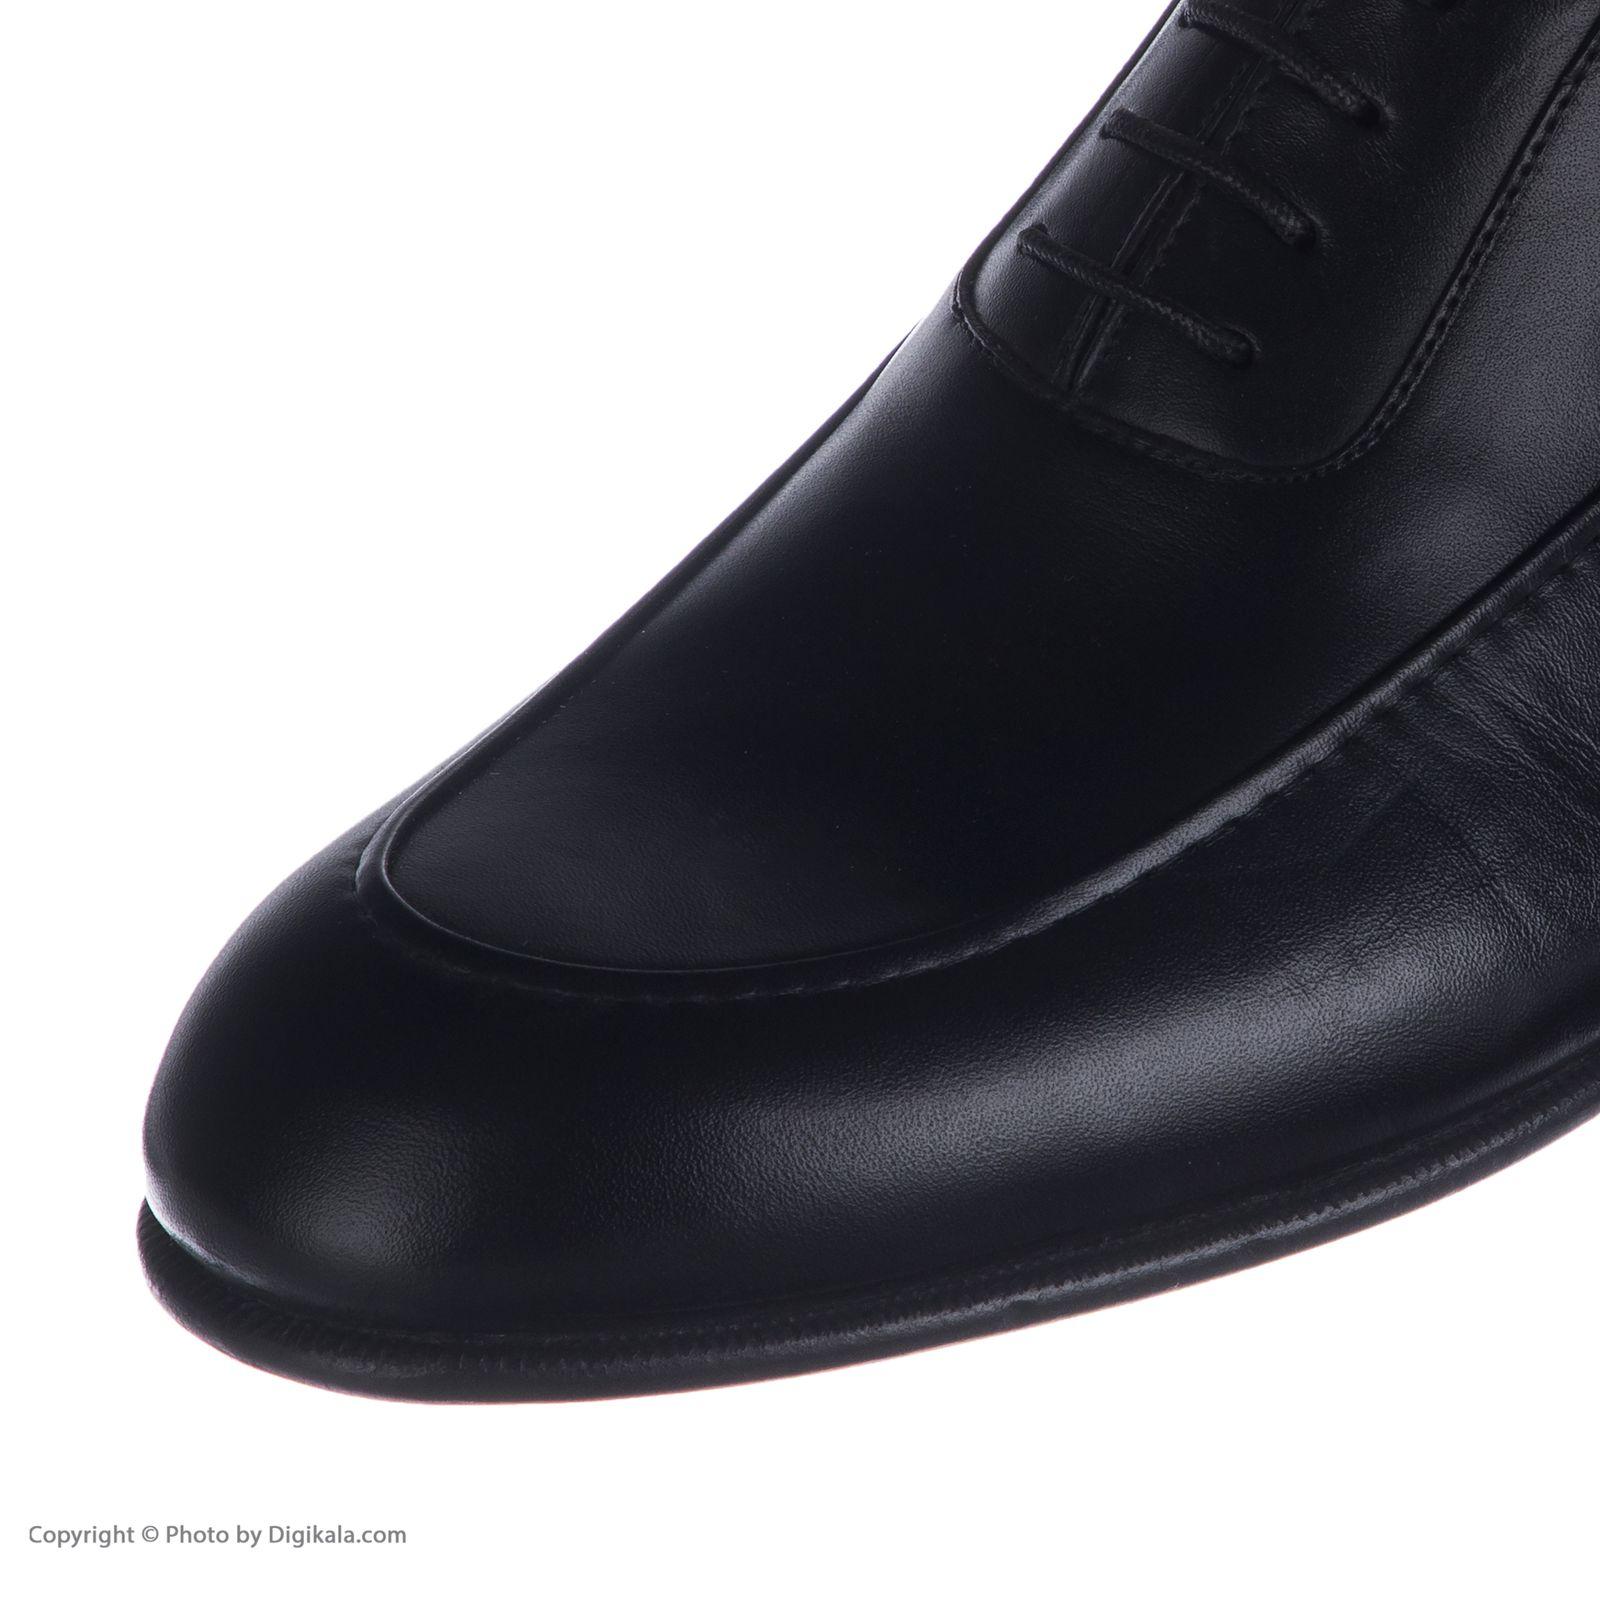 کفش مردانه نظری کد 425 -  - 6